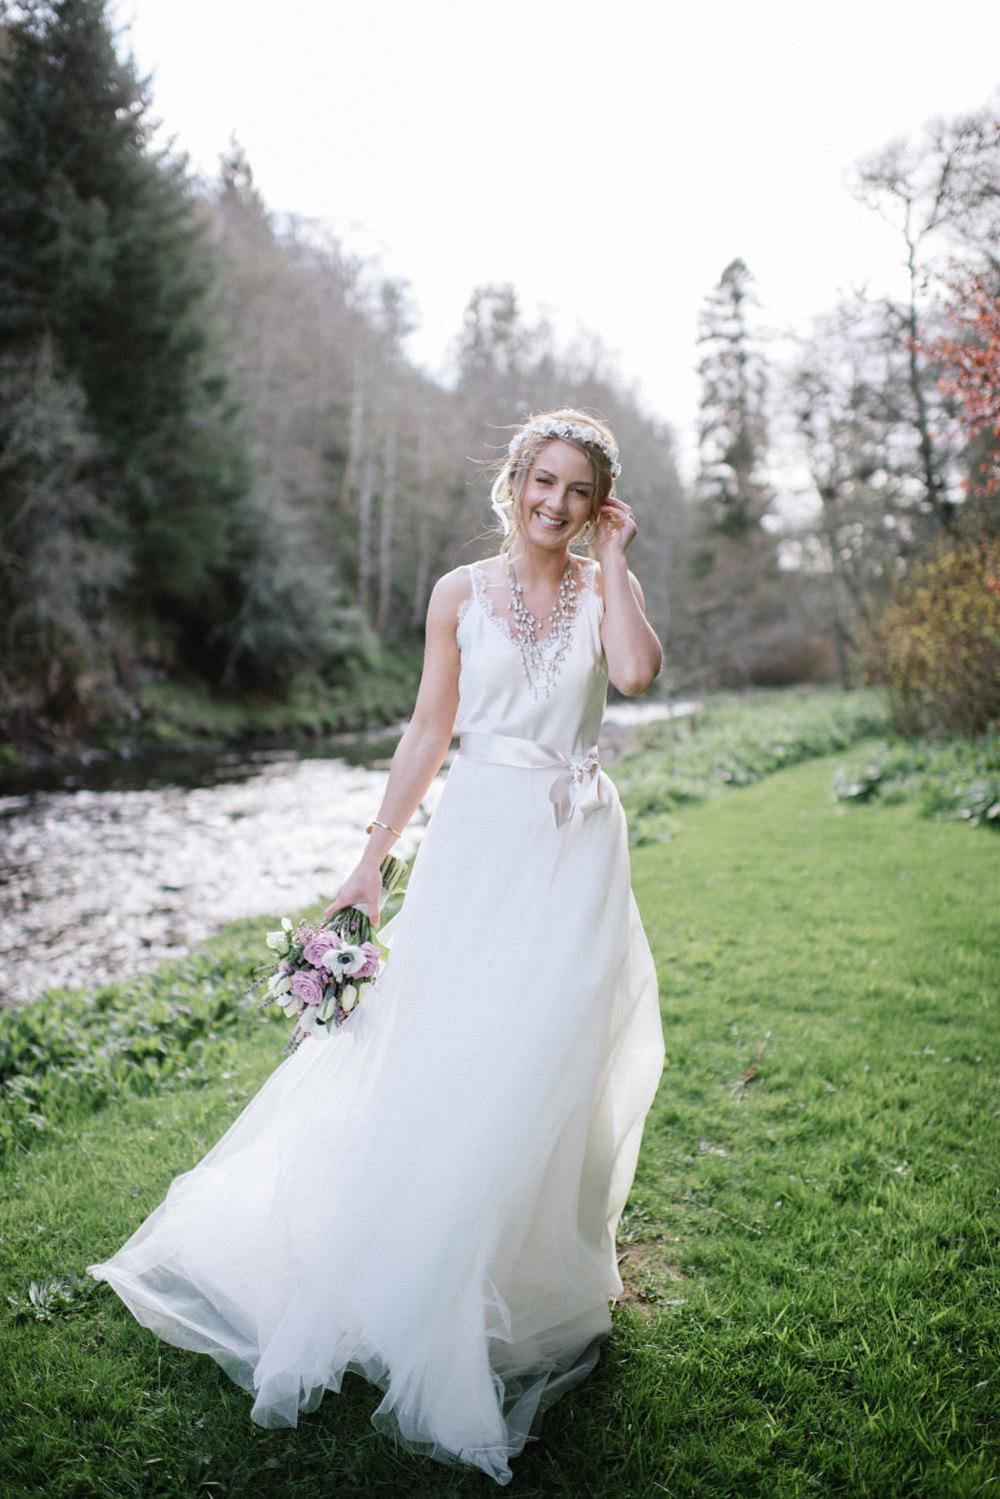 0008-LISA_DEVINE_PHOTOGRAPHY_ALTERNATIVE_WEDDING_PHOTOGRAPHY_SCOTLAND.JPG